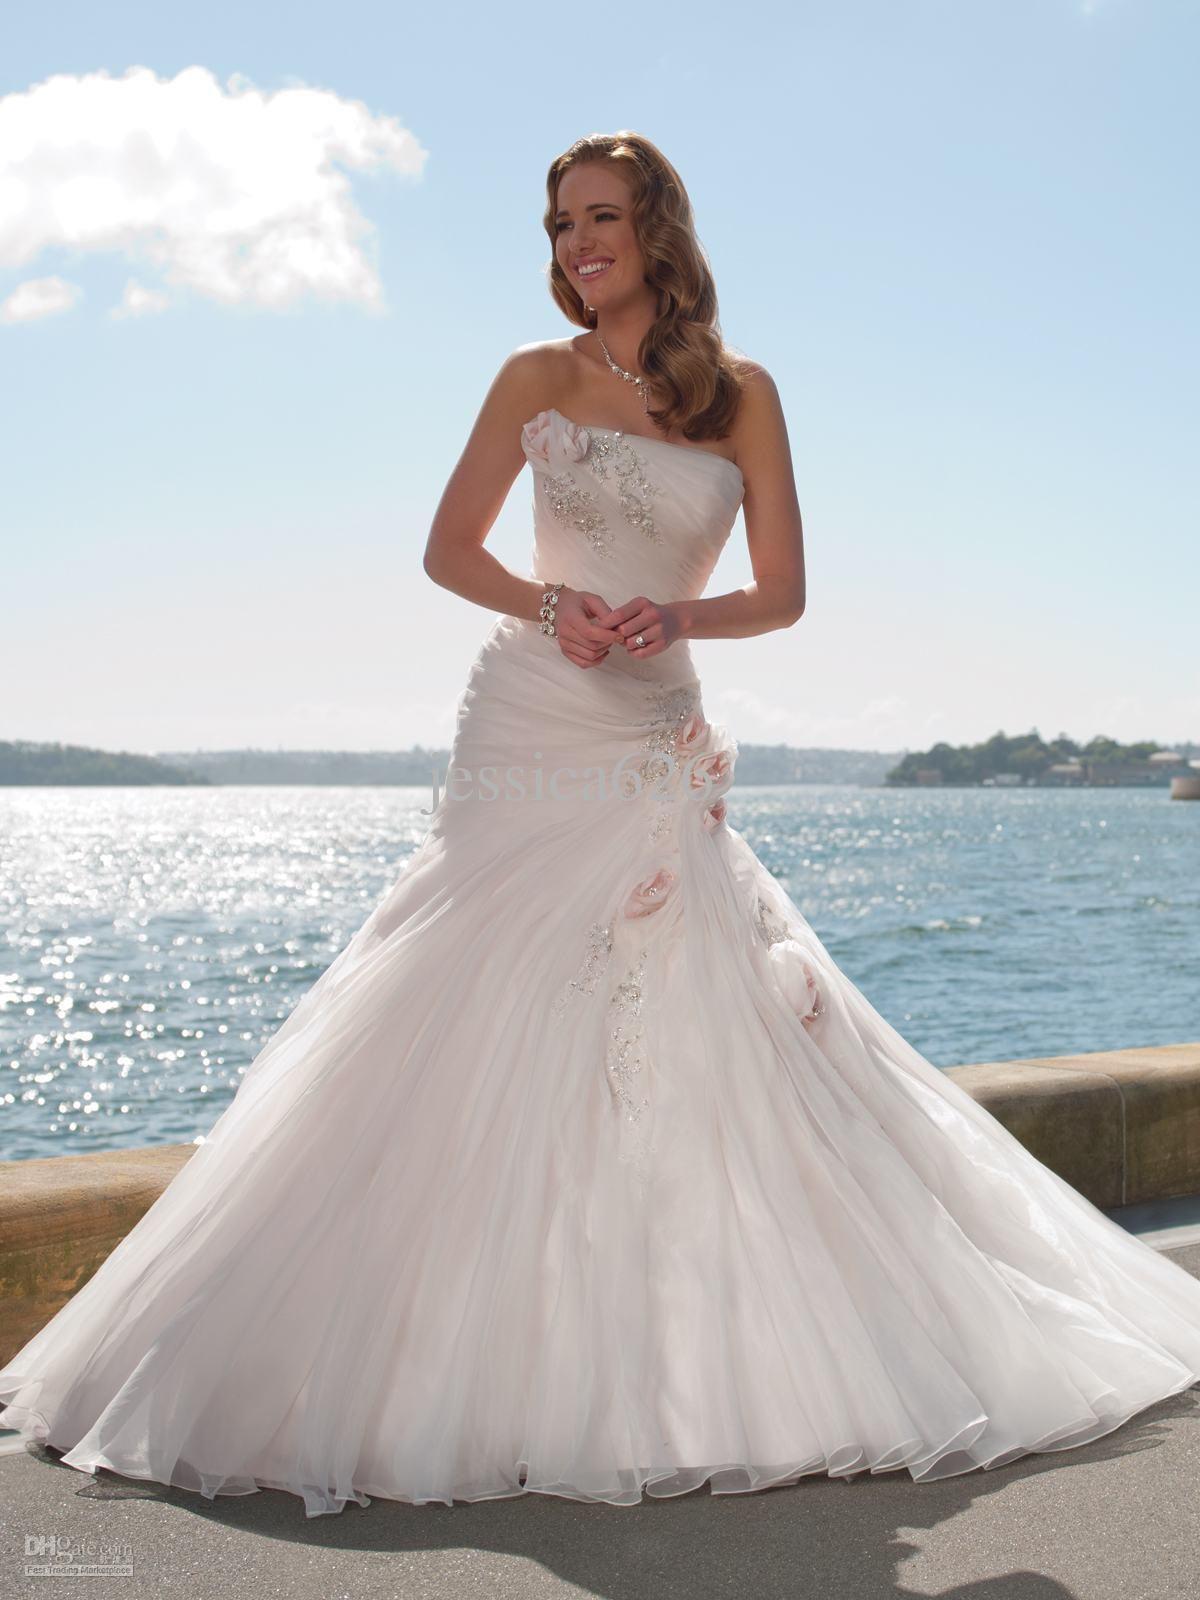 Wedding dresses on short brides  Summer Outside Wedding Dresses  Womenus Dresses for Weddings Check